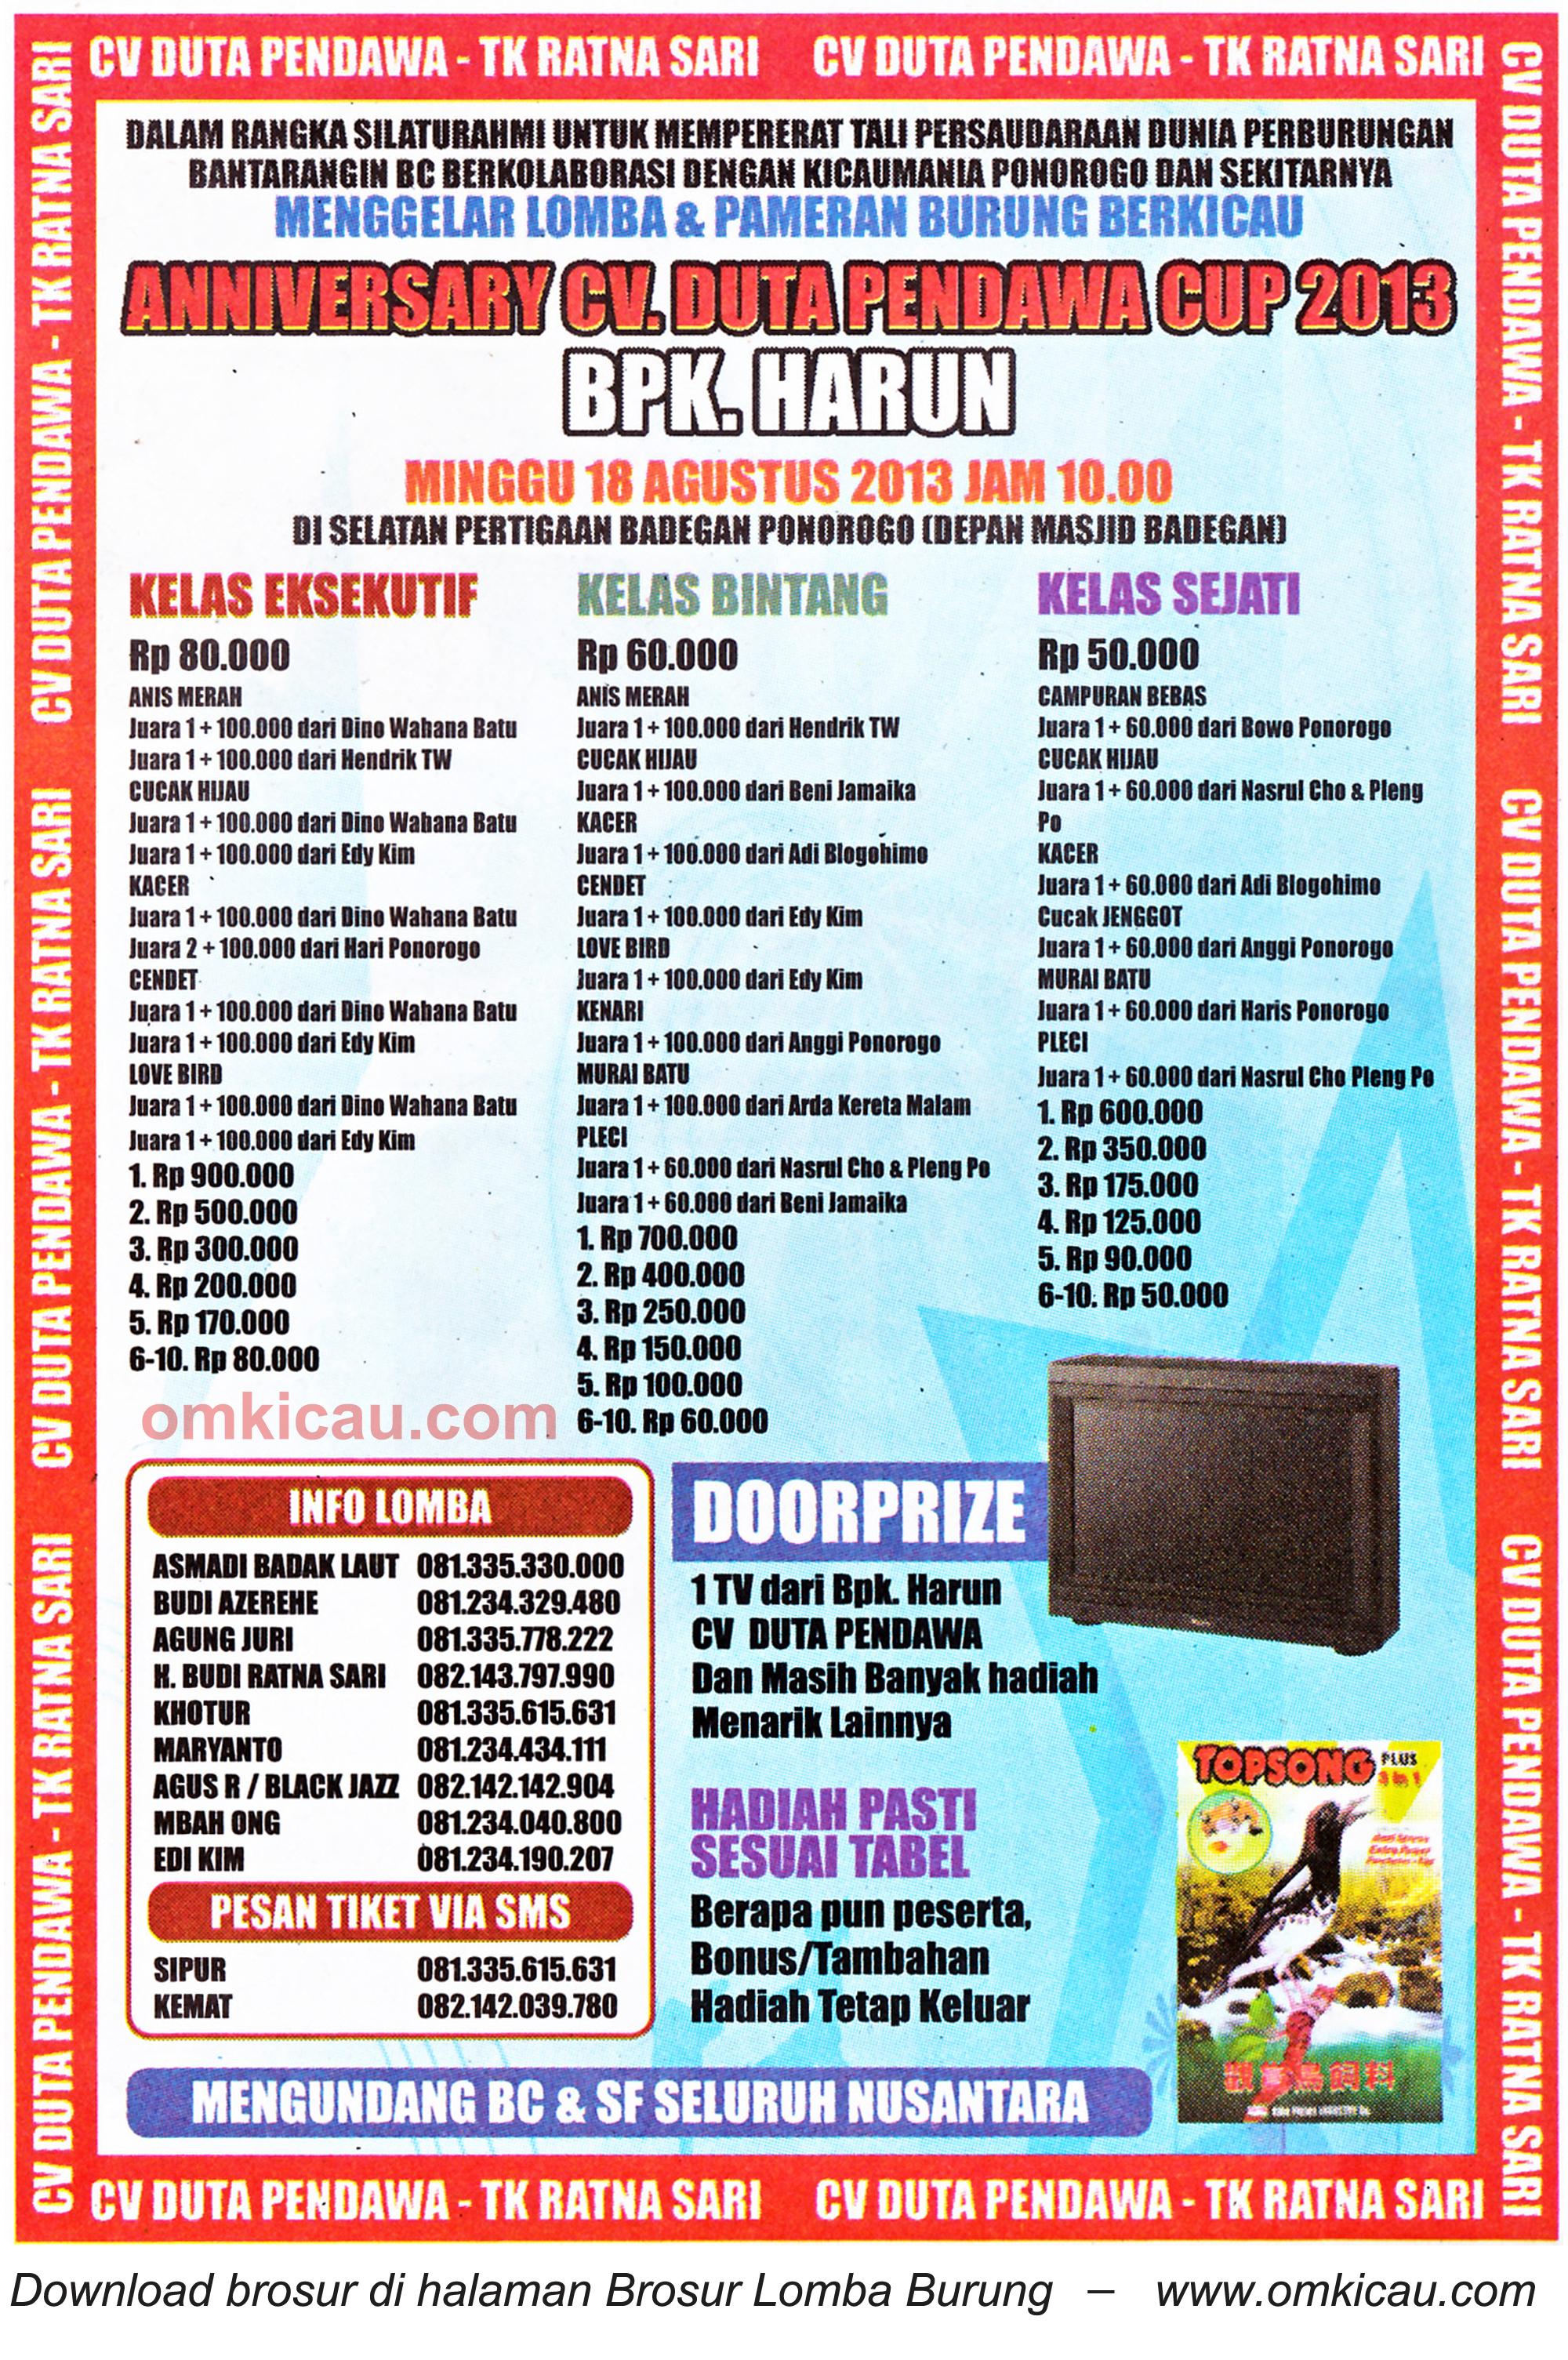 Brosur Lomba Duta Pendawa Cup Ponorogo 18 Agustus 2013